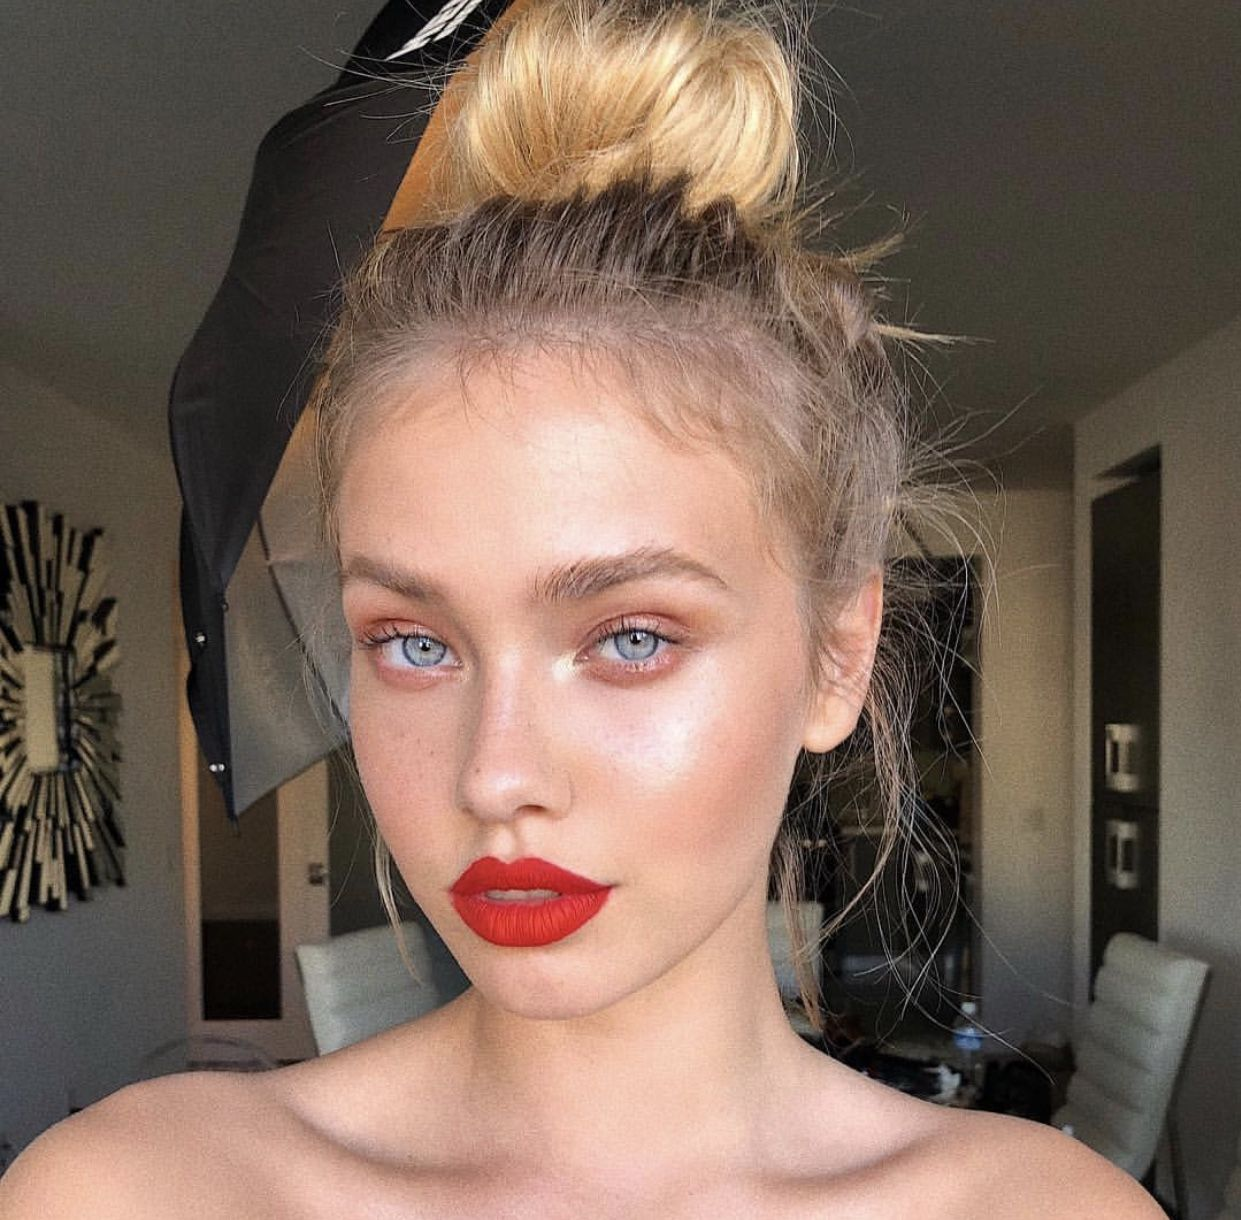 Selfie Adelina Sharipova nudes (83 photos), Sexy, Paparazzi, Instagram, butt 2015